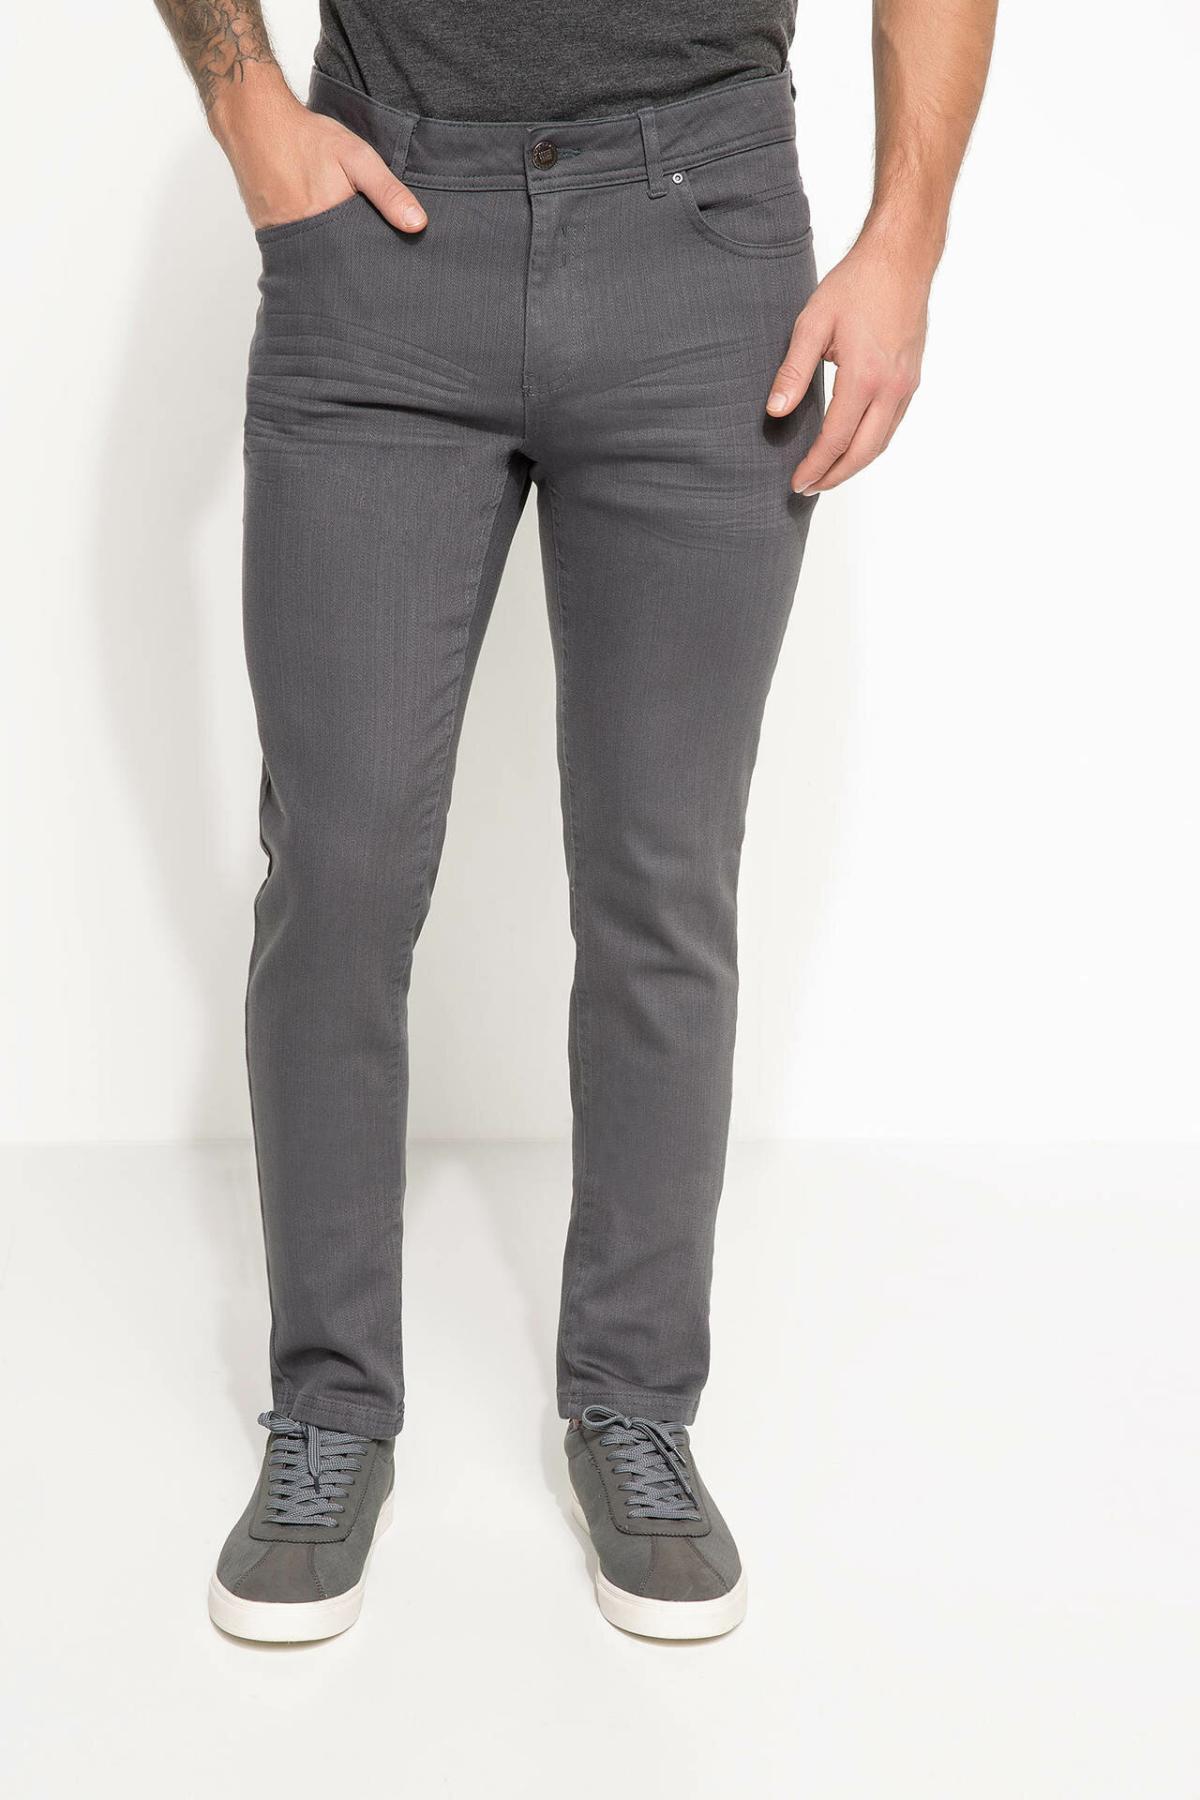 DeFacto Man Trousers-I7925AZ18SP